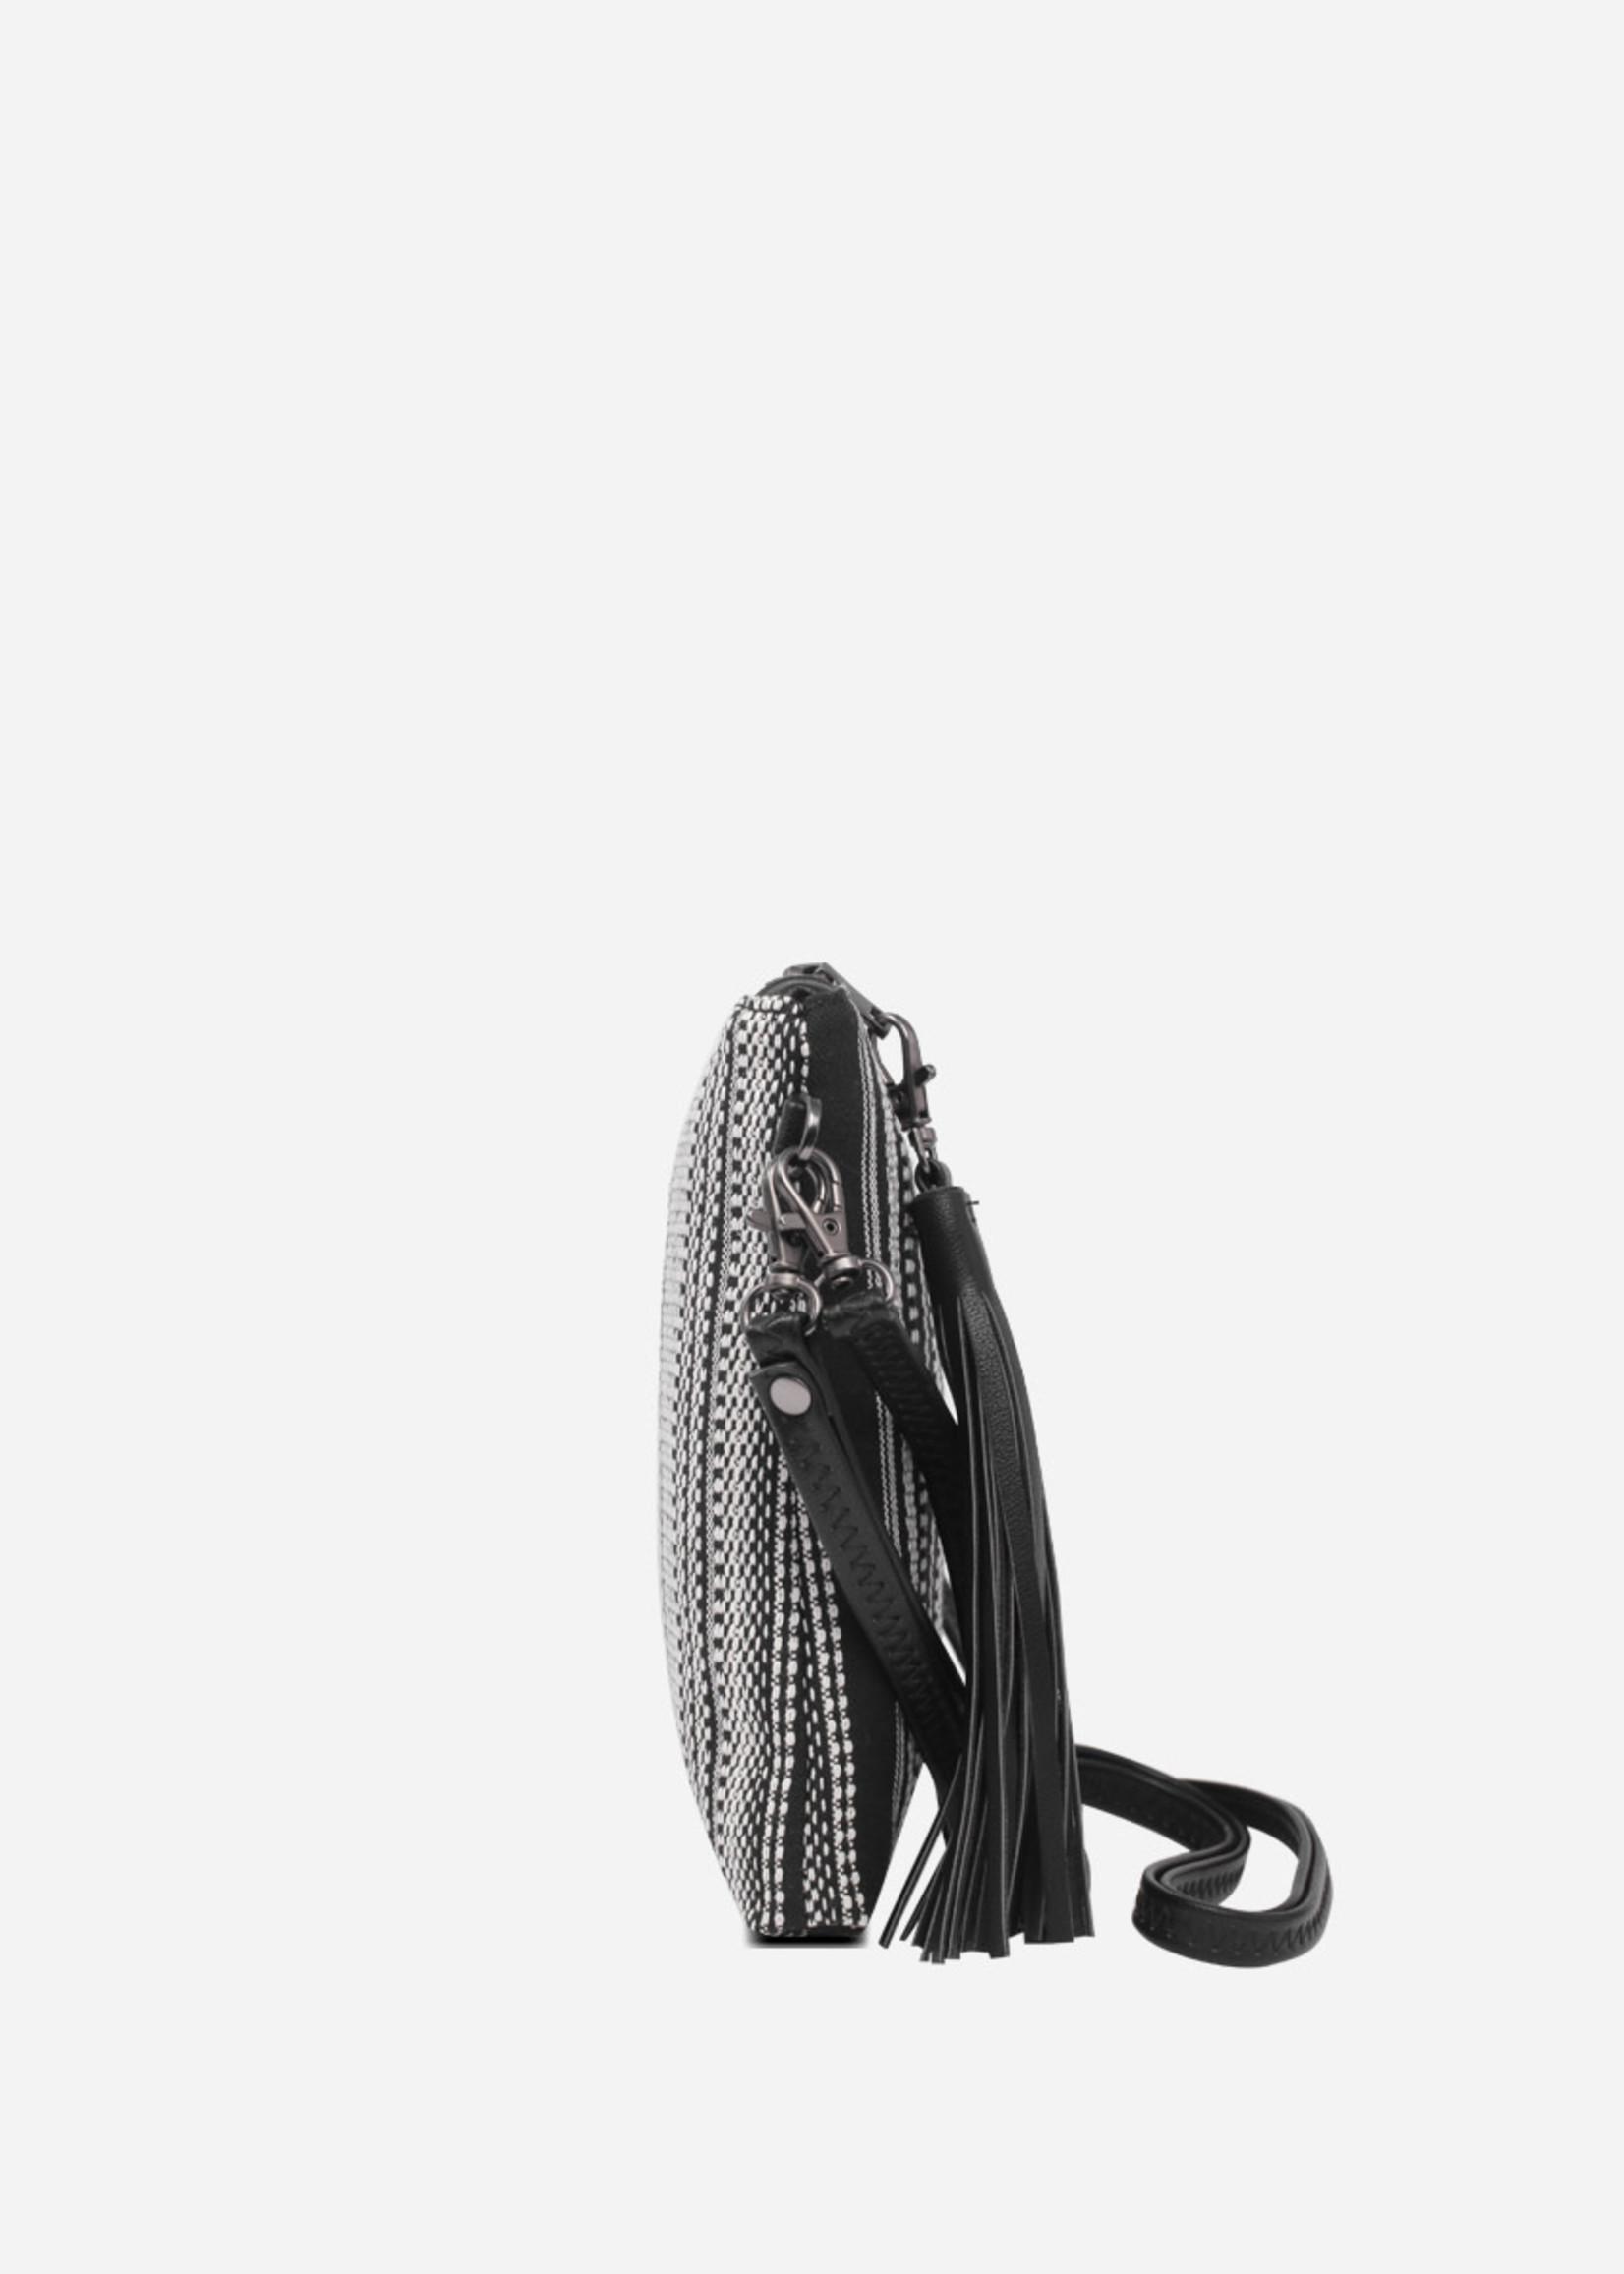 PIXIE MOOD Michelle Clutch BLACK+WHITE WOVEN